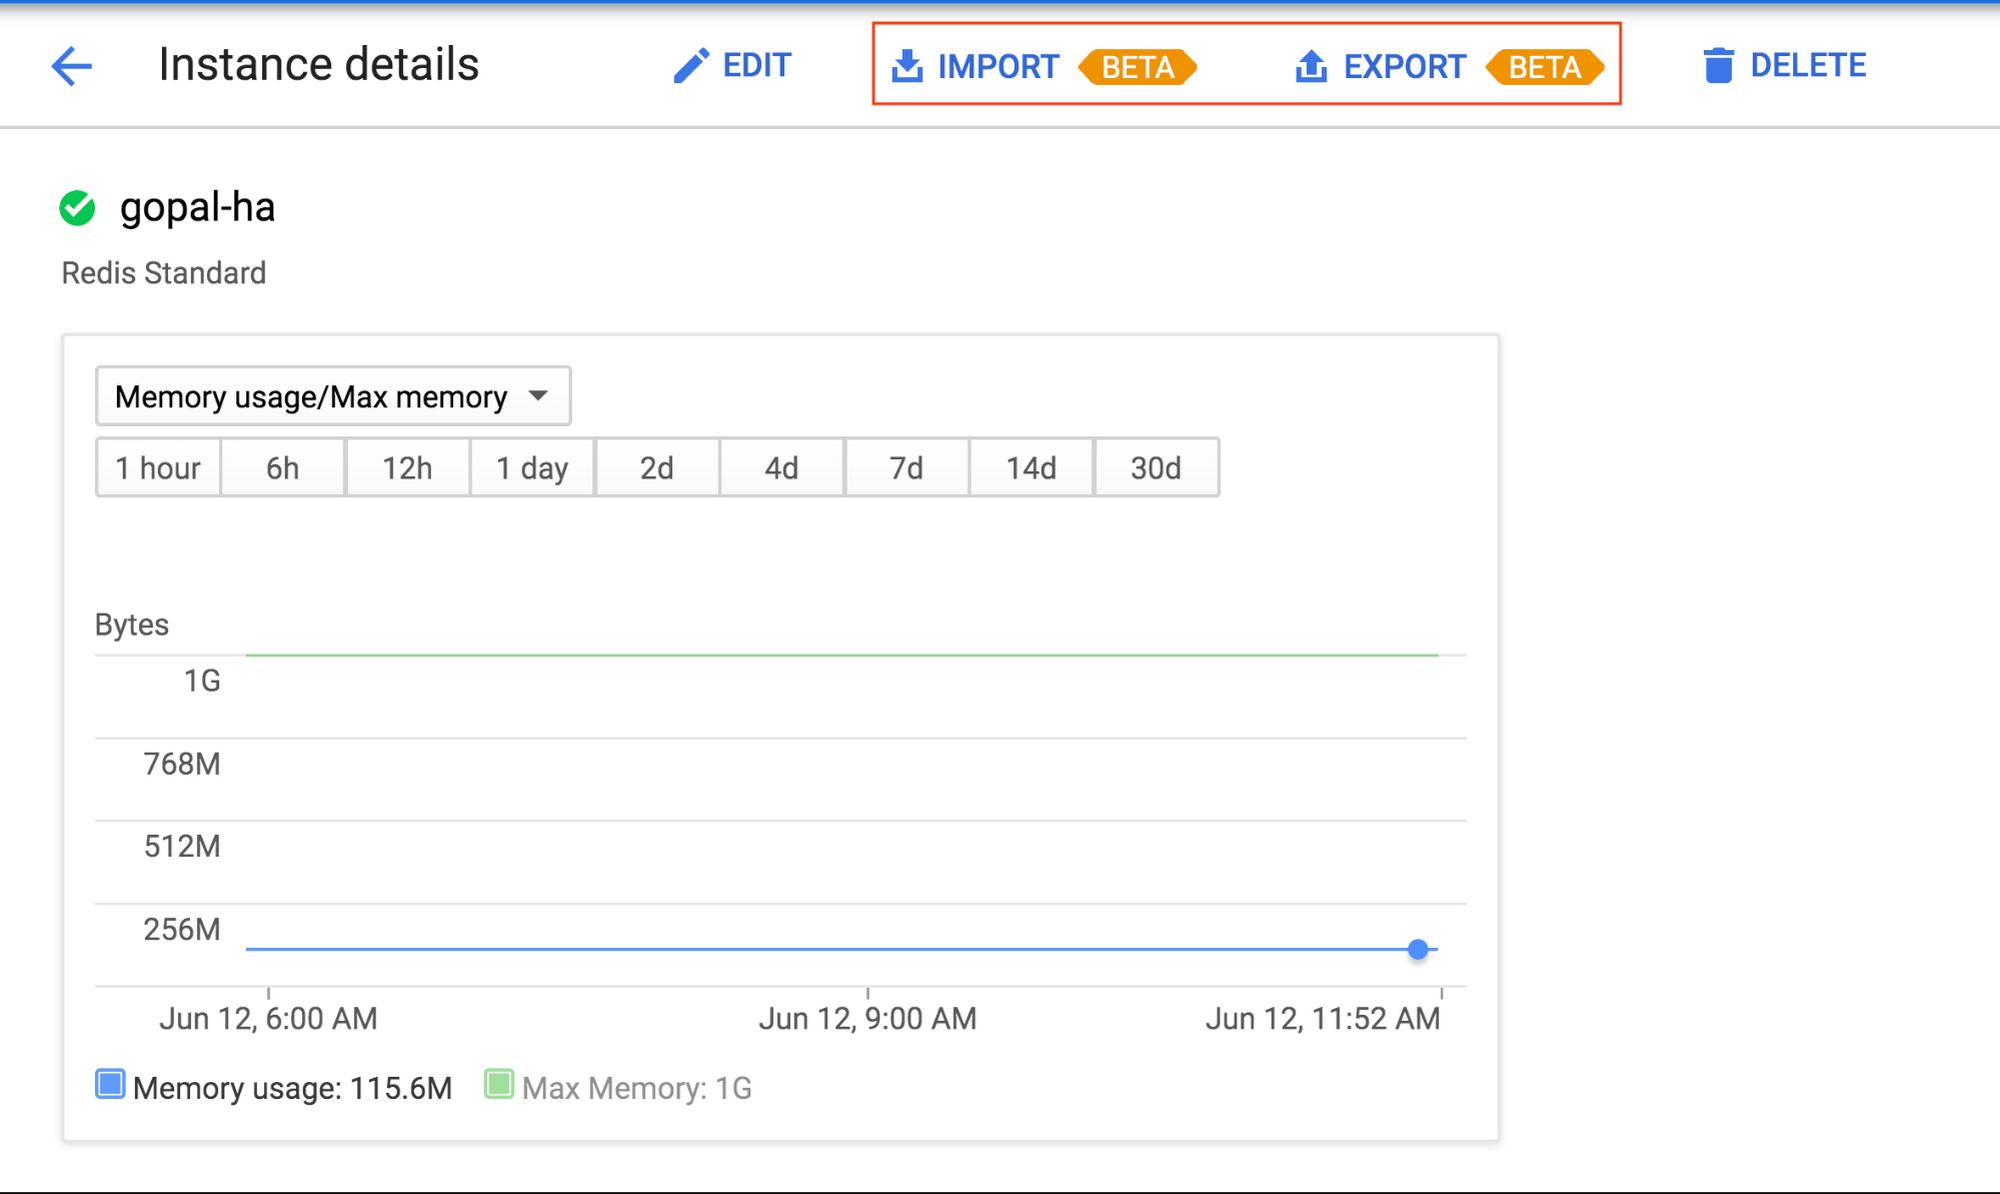 Cloud Memorystore instance details.png